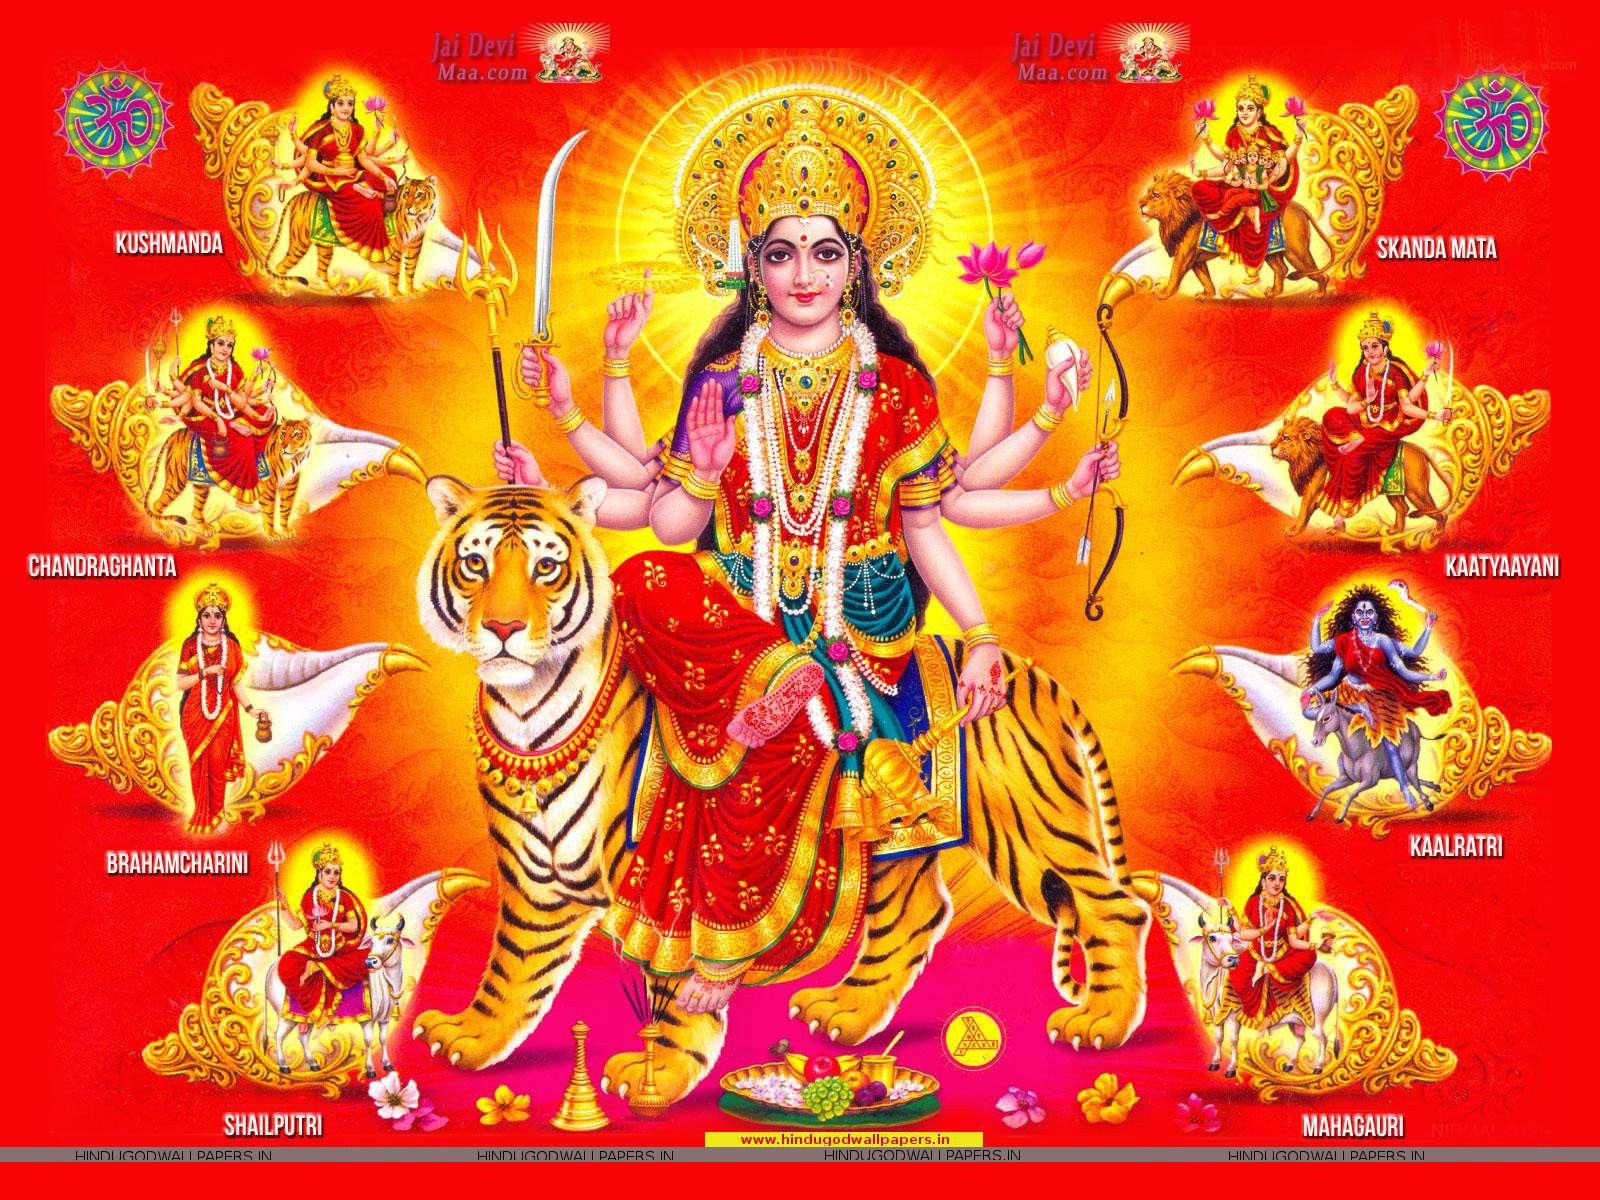 Navratri Wallpaper Full Size Free Download Hindu God Wallpapers Durga Durga Maa Durga Goddess